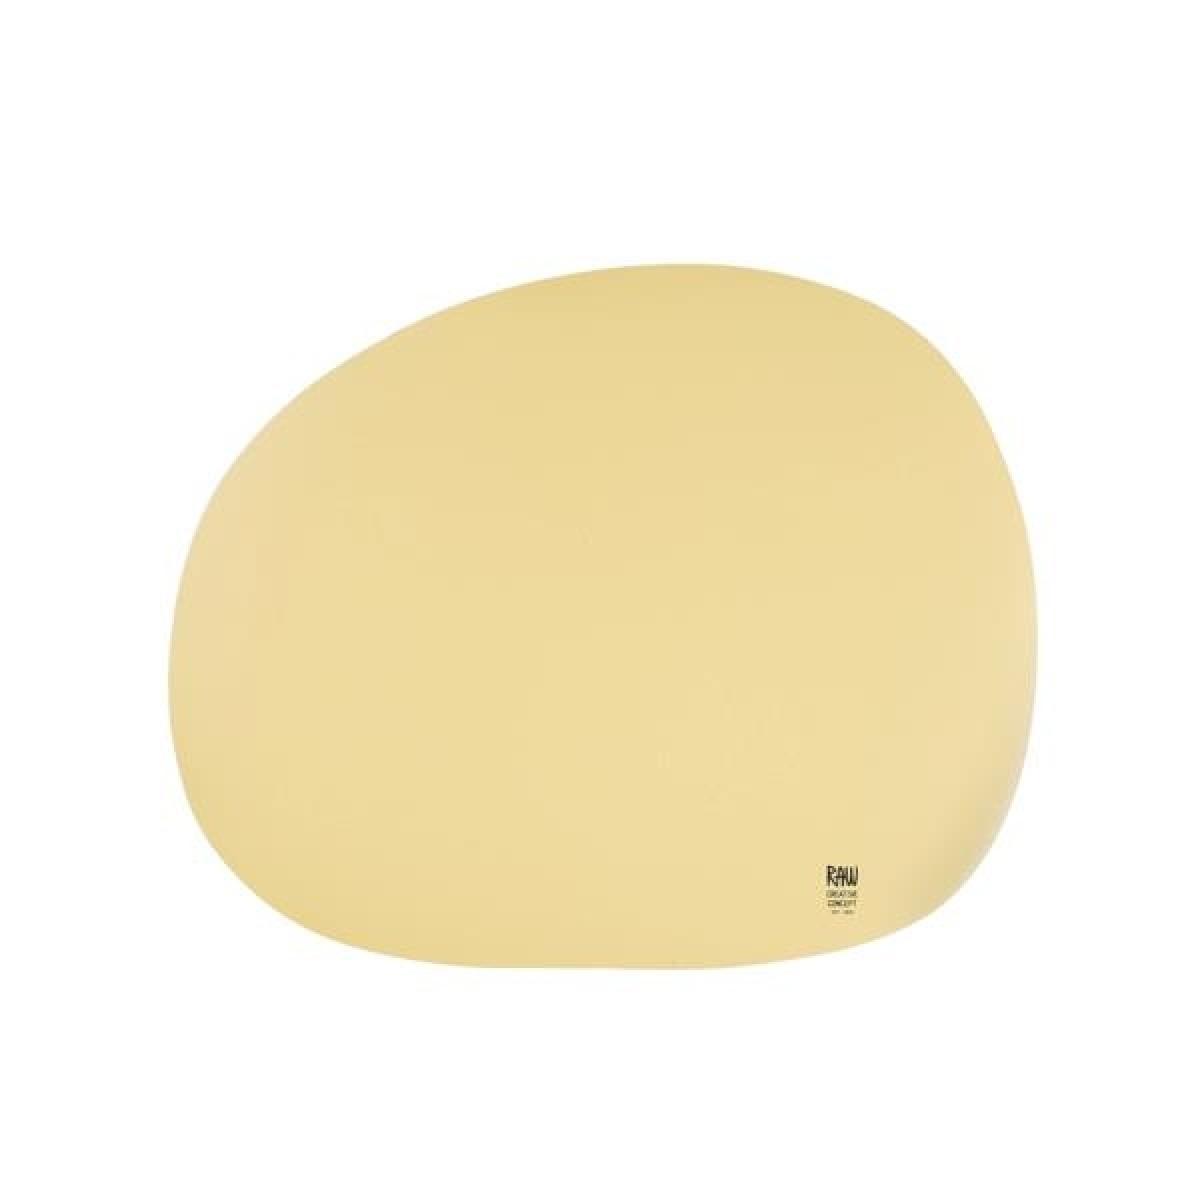 AIDA Raw dækkeserviet lys gul